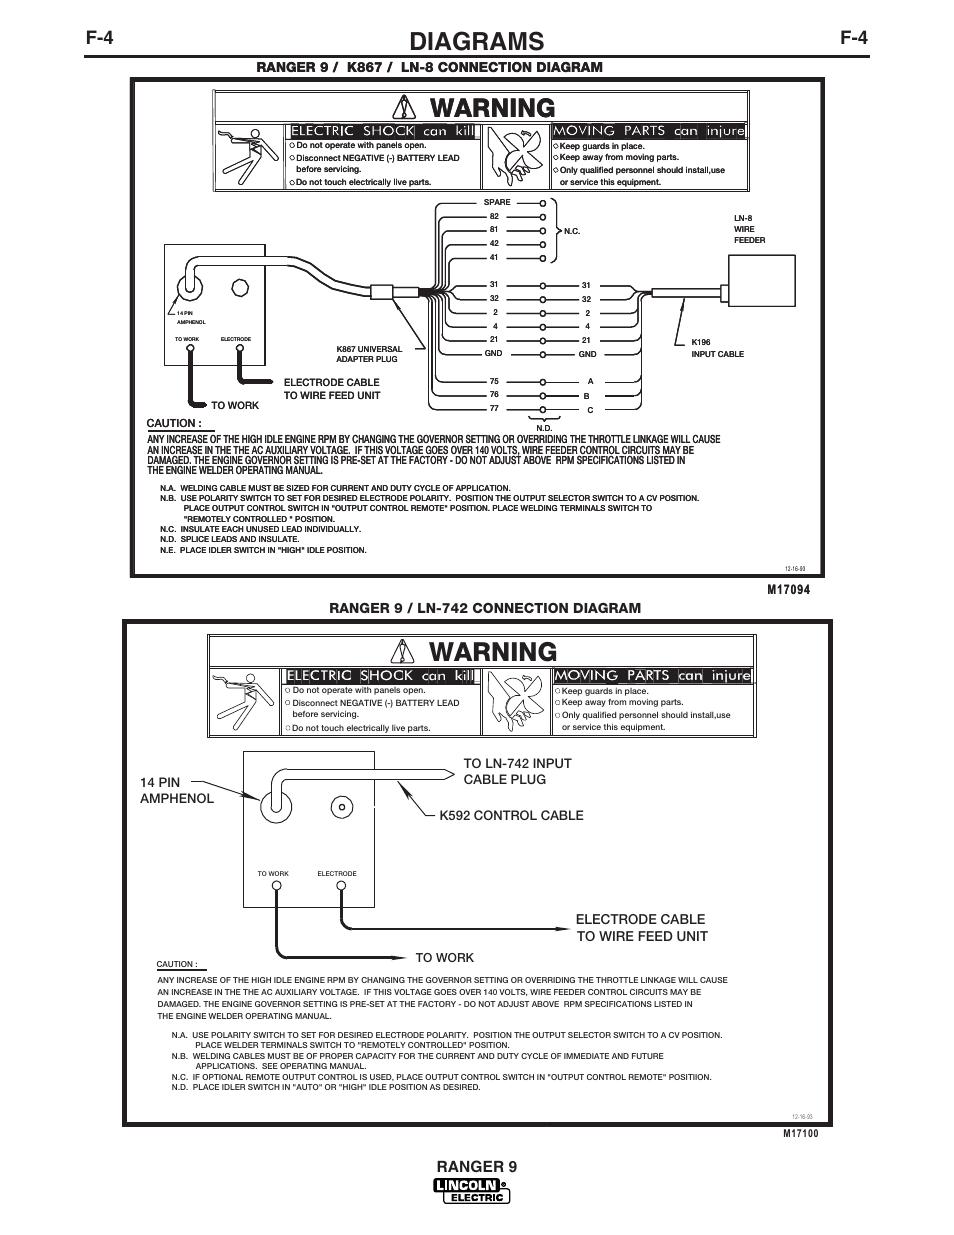 diagrams, warning, ranger 9 | lincoln electric im753 ranger 9 user manual |  page 36 / 44